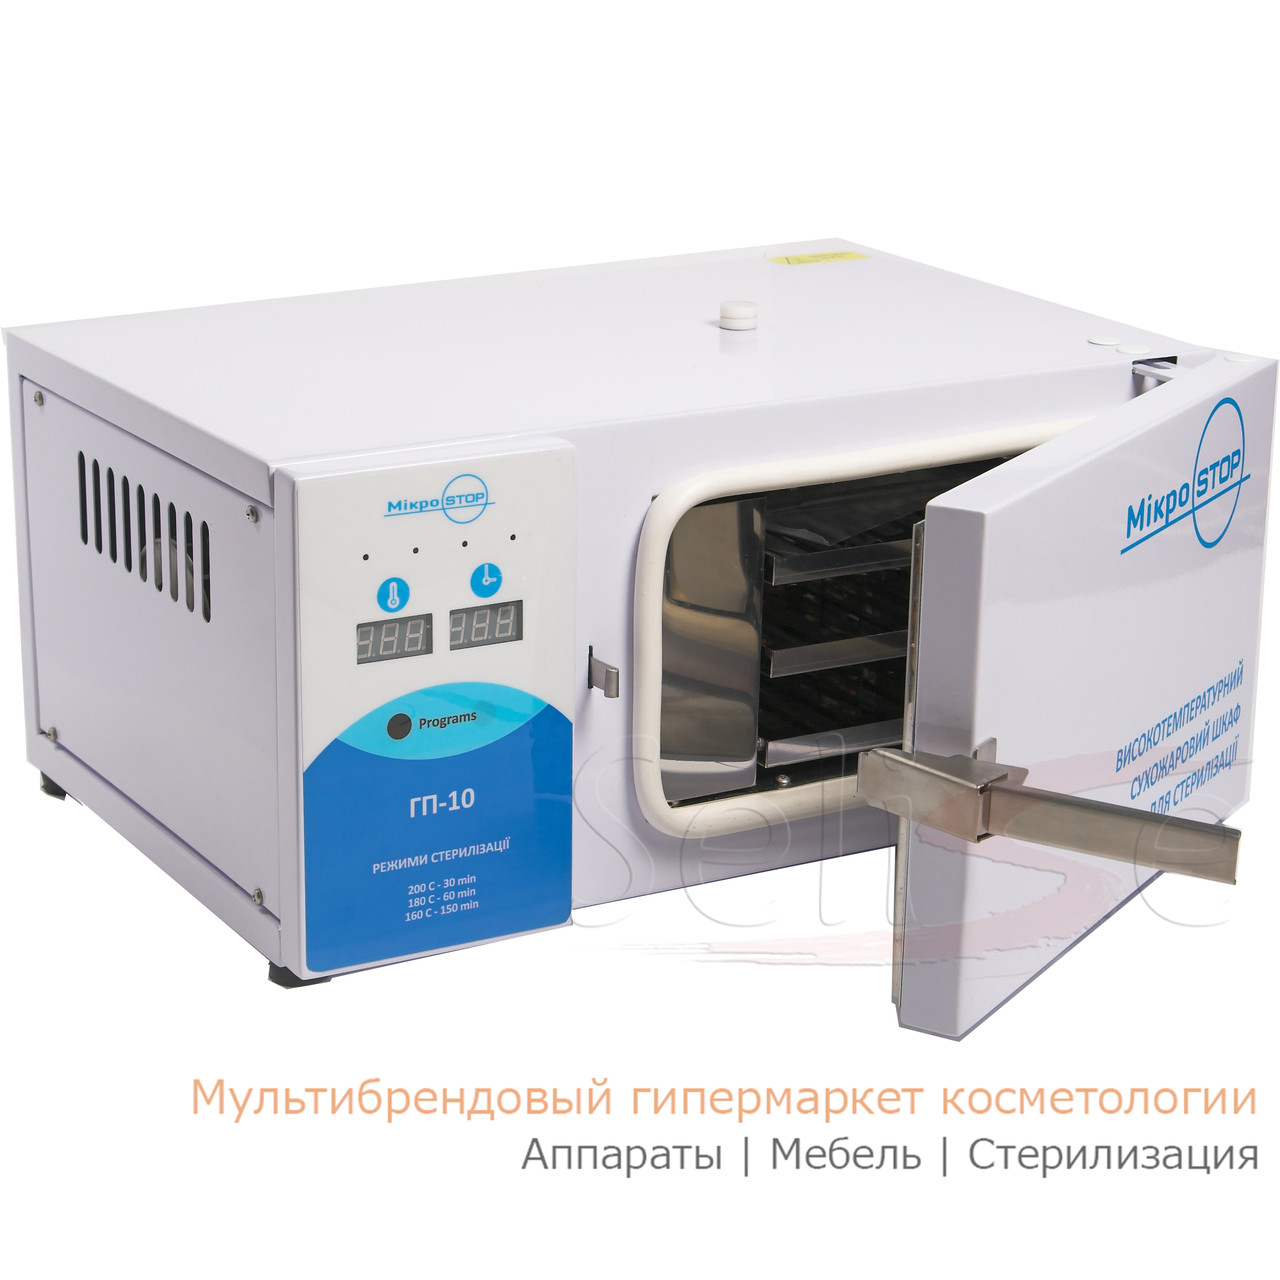 Микростоп ГП-10